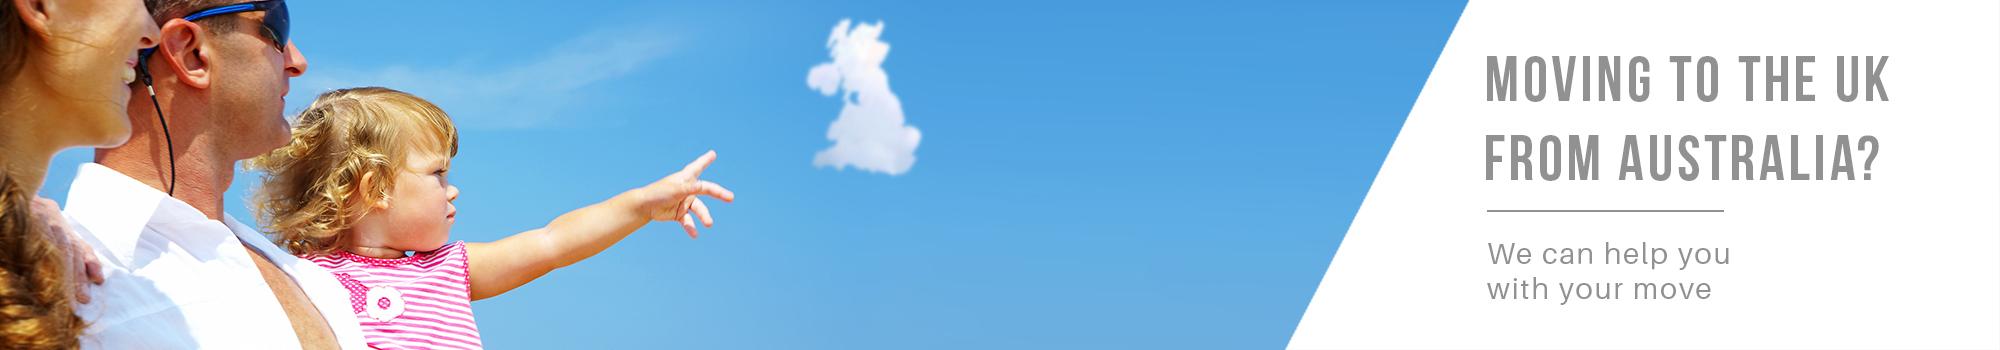 Moving to United Kingdom UK from Australia - International Removalists - Dawson